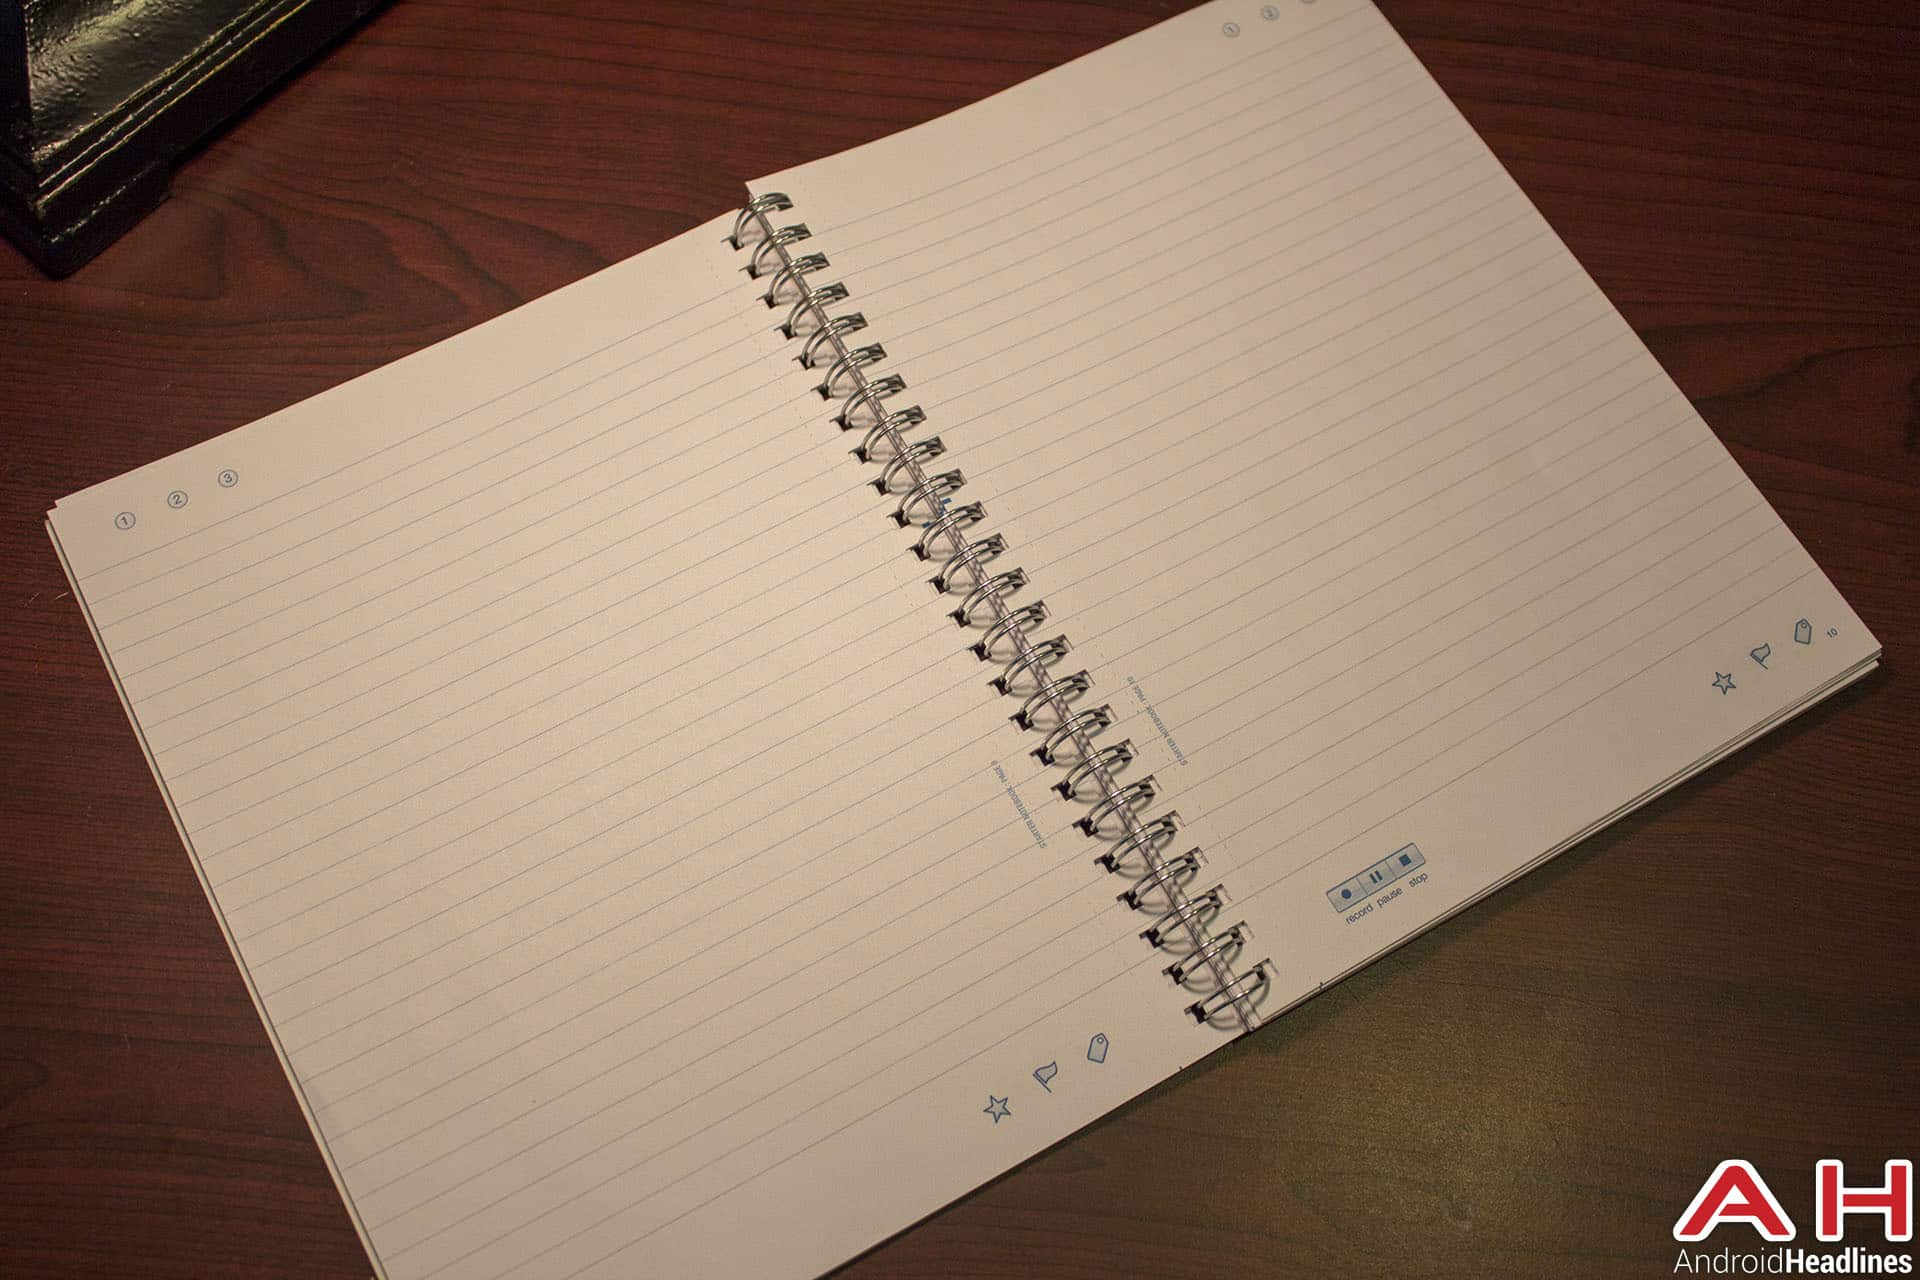 livescribe-3-notebook-4